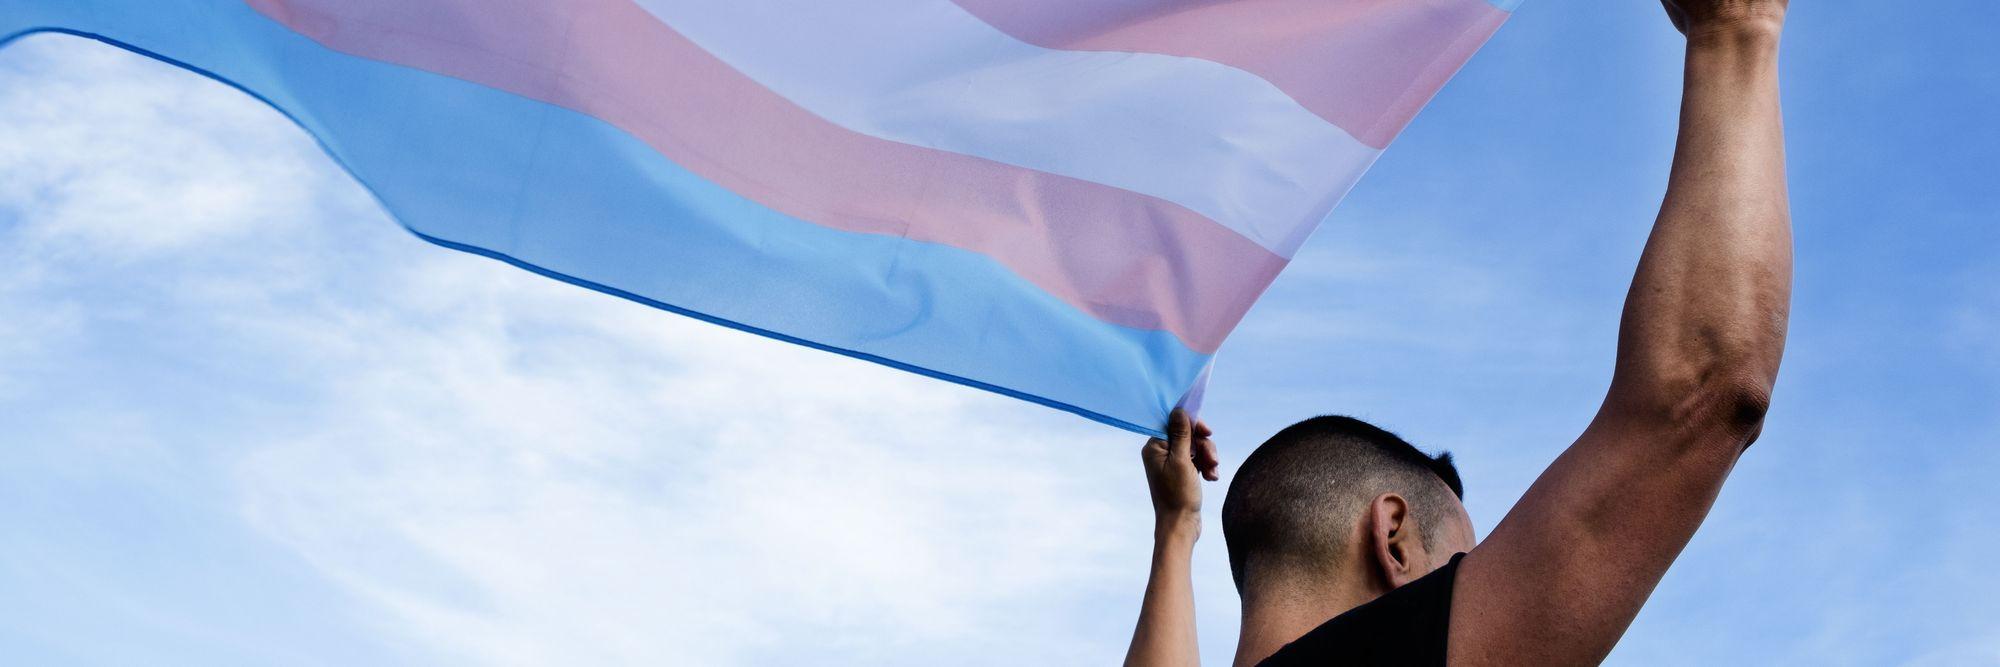 A closeup of the Transgender Pride flag